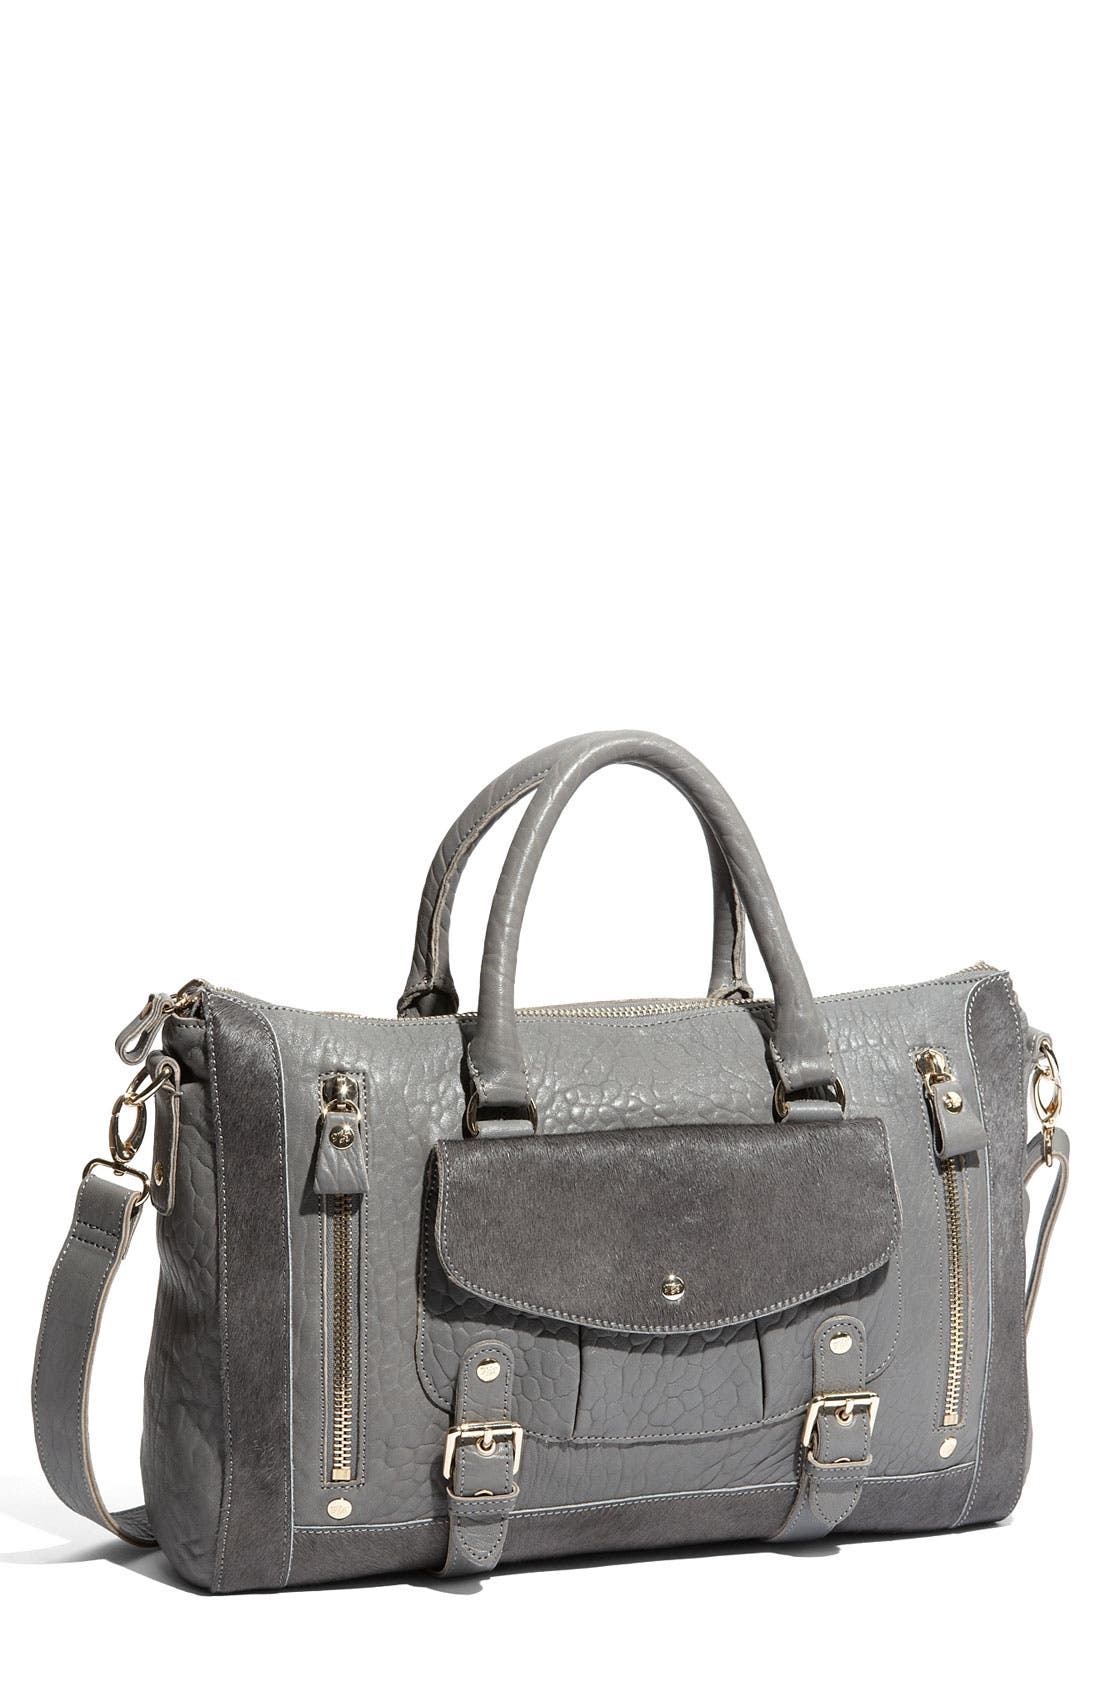 Alternate Image 1 Selected - Ted Baker London 'Buckle Pocket' Leather & Calf Hair Weekend Bag